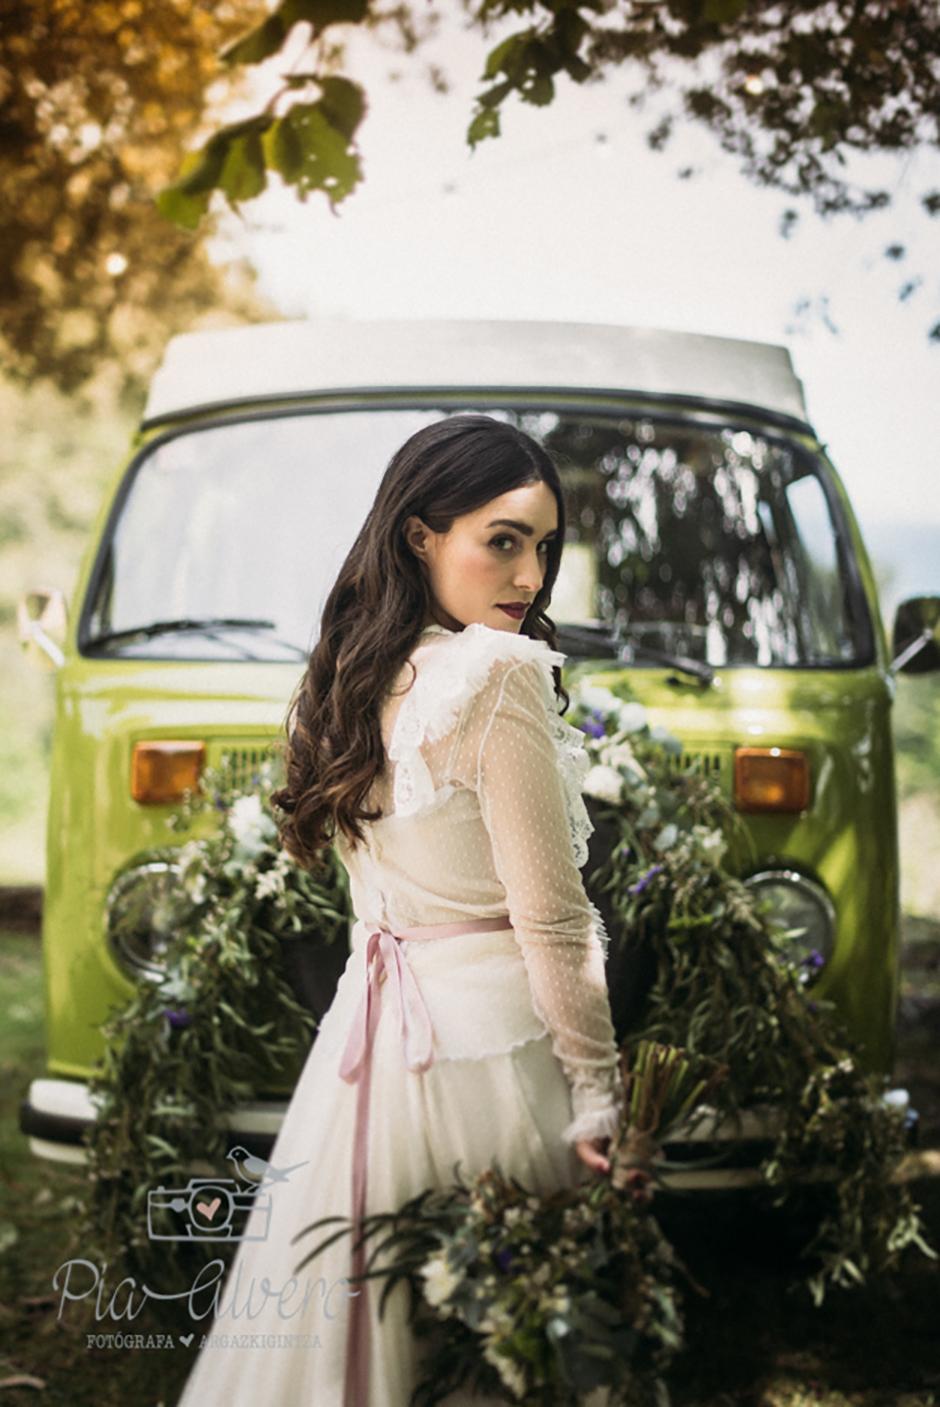 Pia Alvero fotografia editorial inspiracion de boda-298